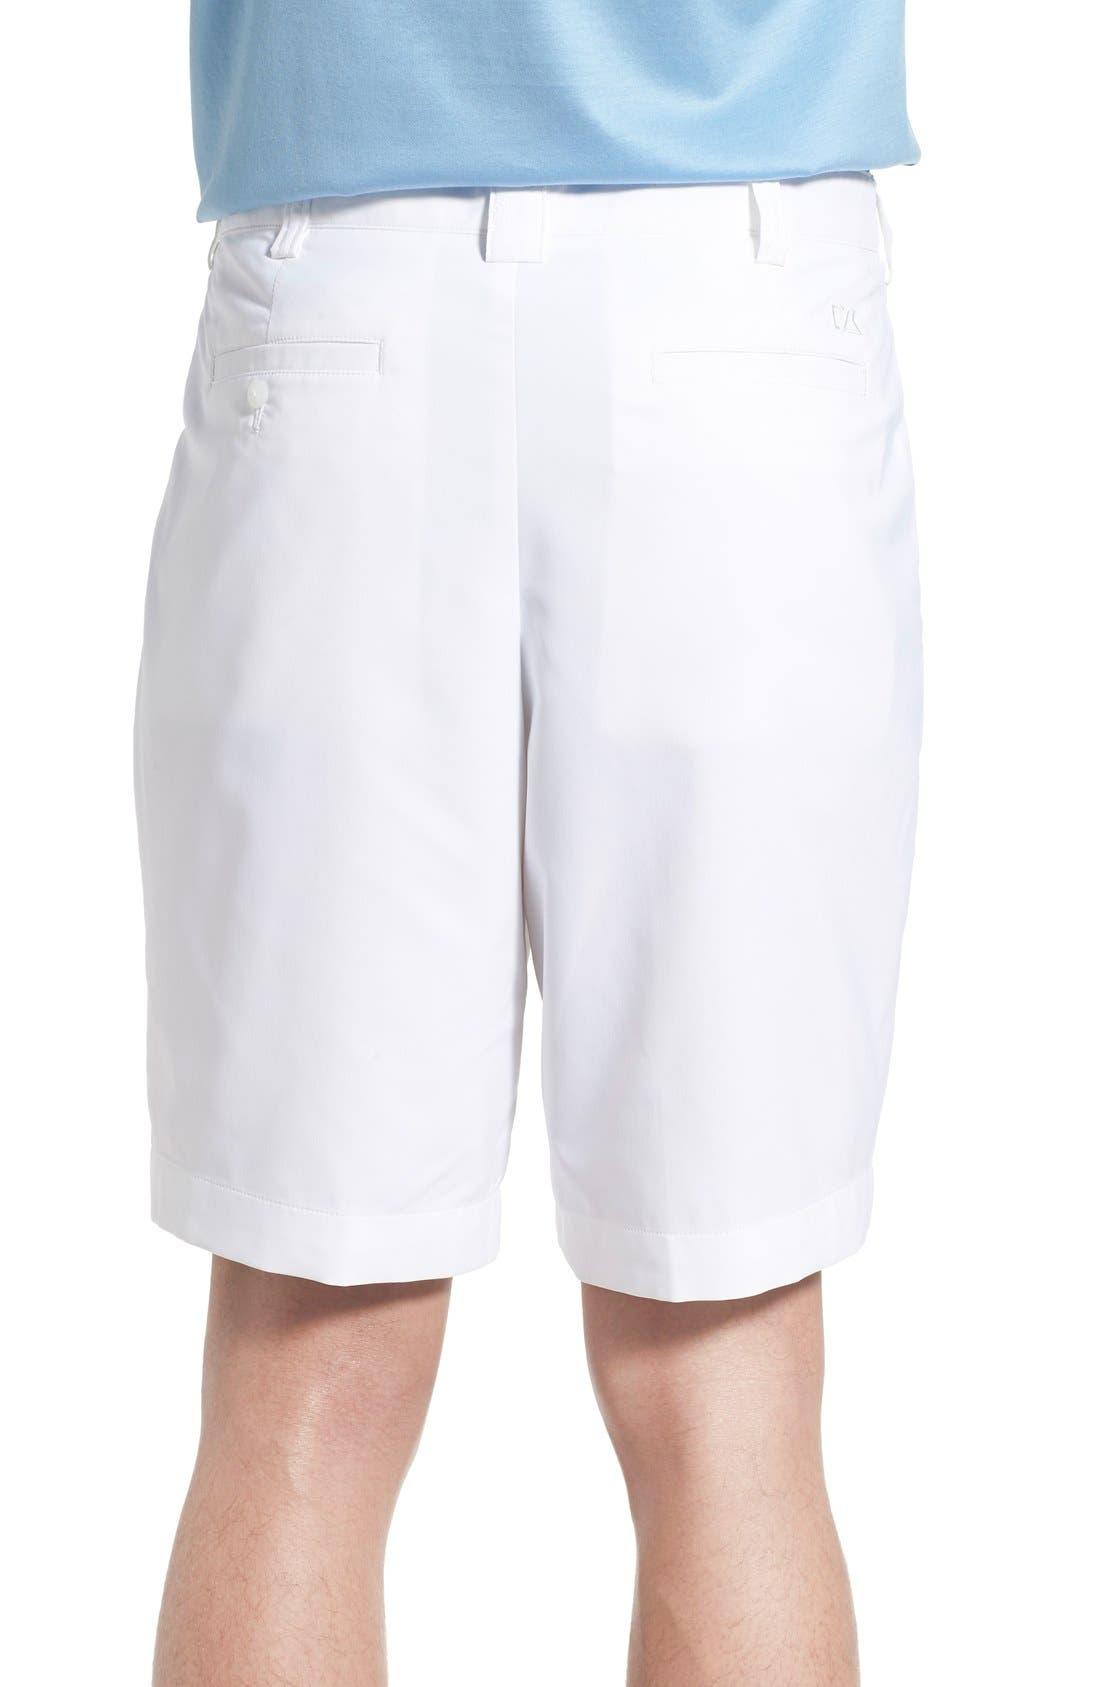 DryTec Shorts,                             Alternate thumbnail 2, color,                             WHITE